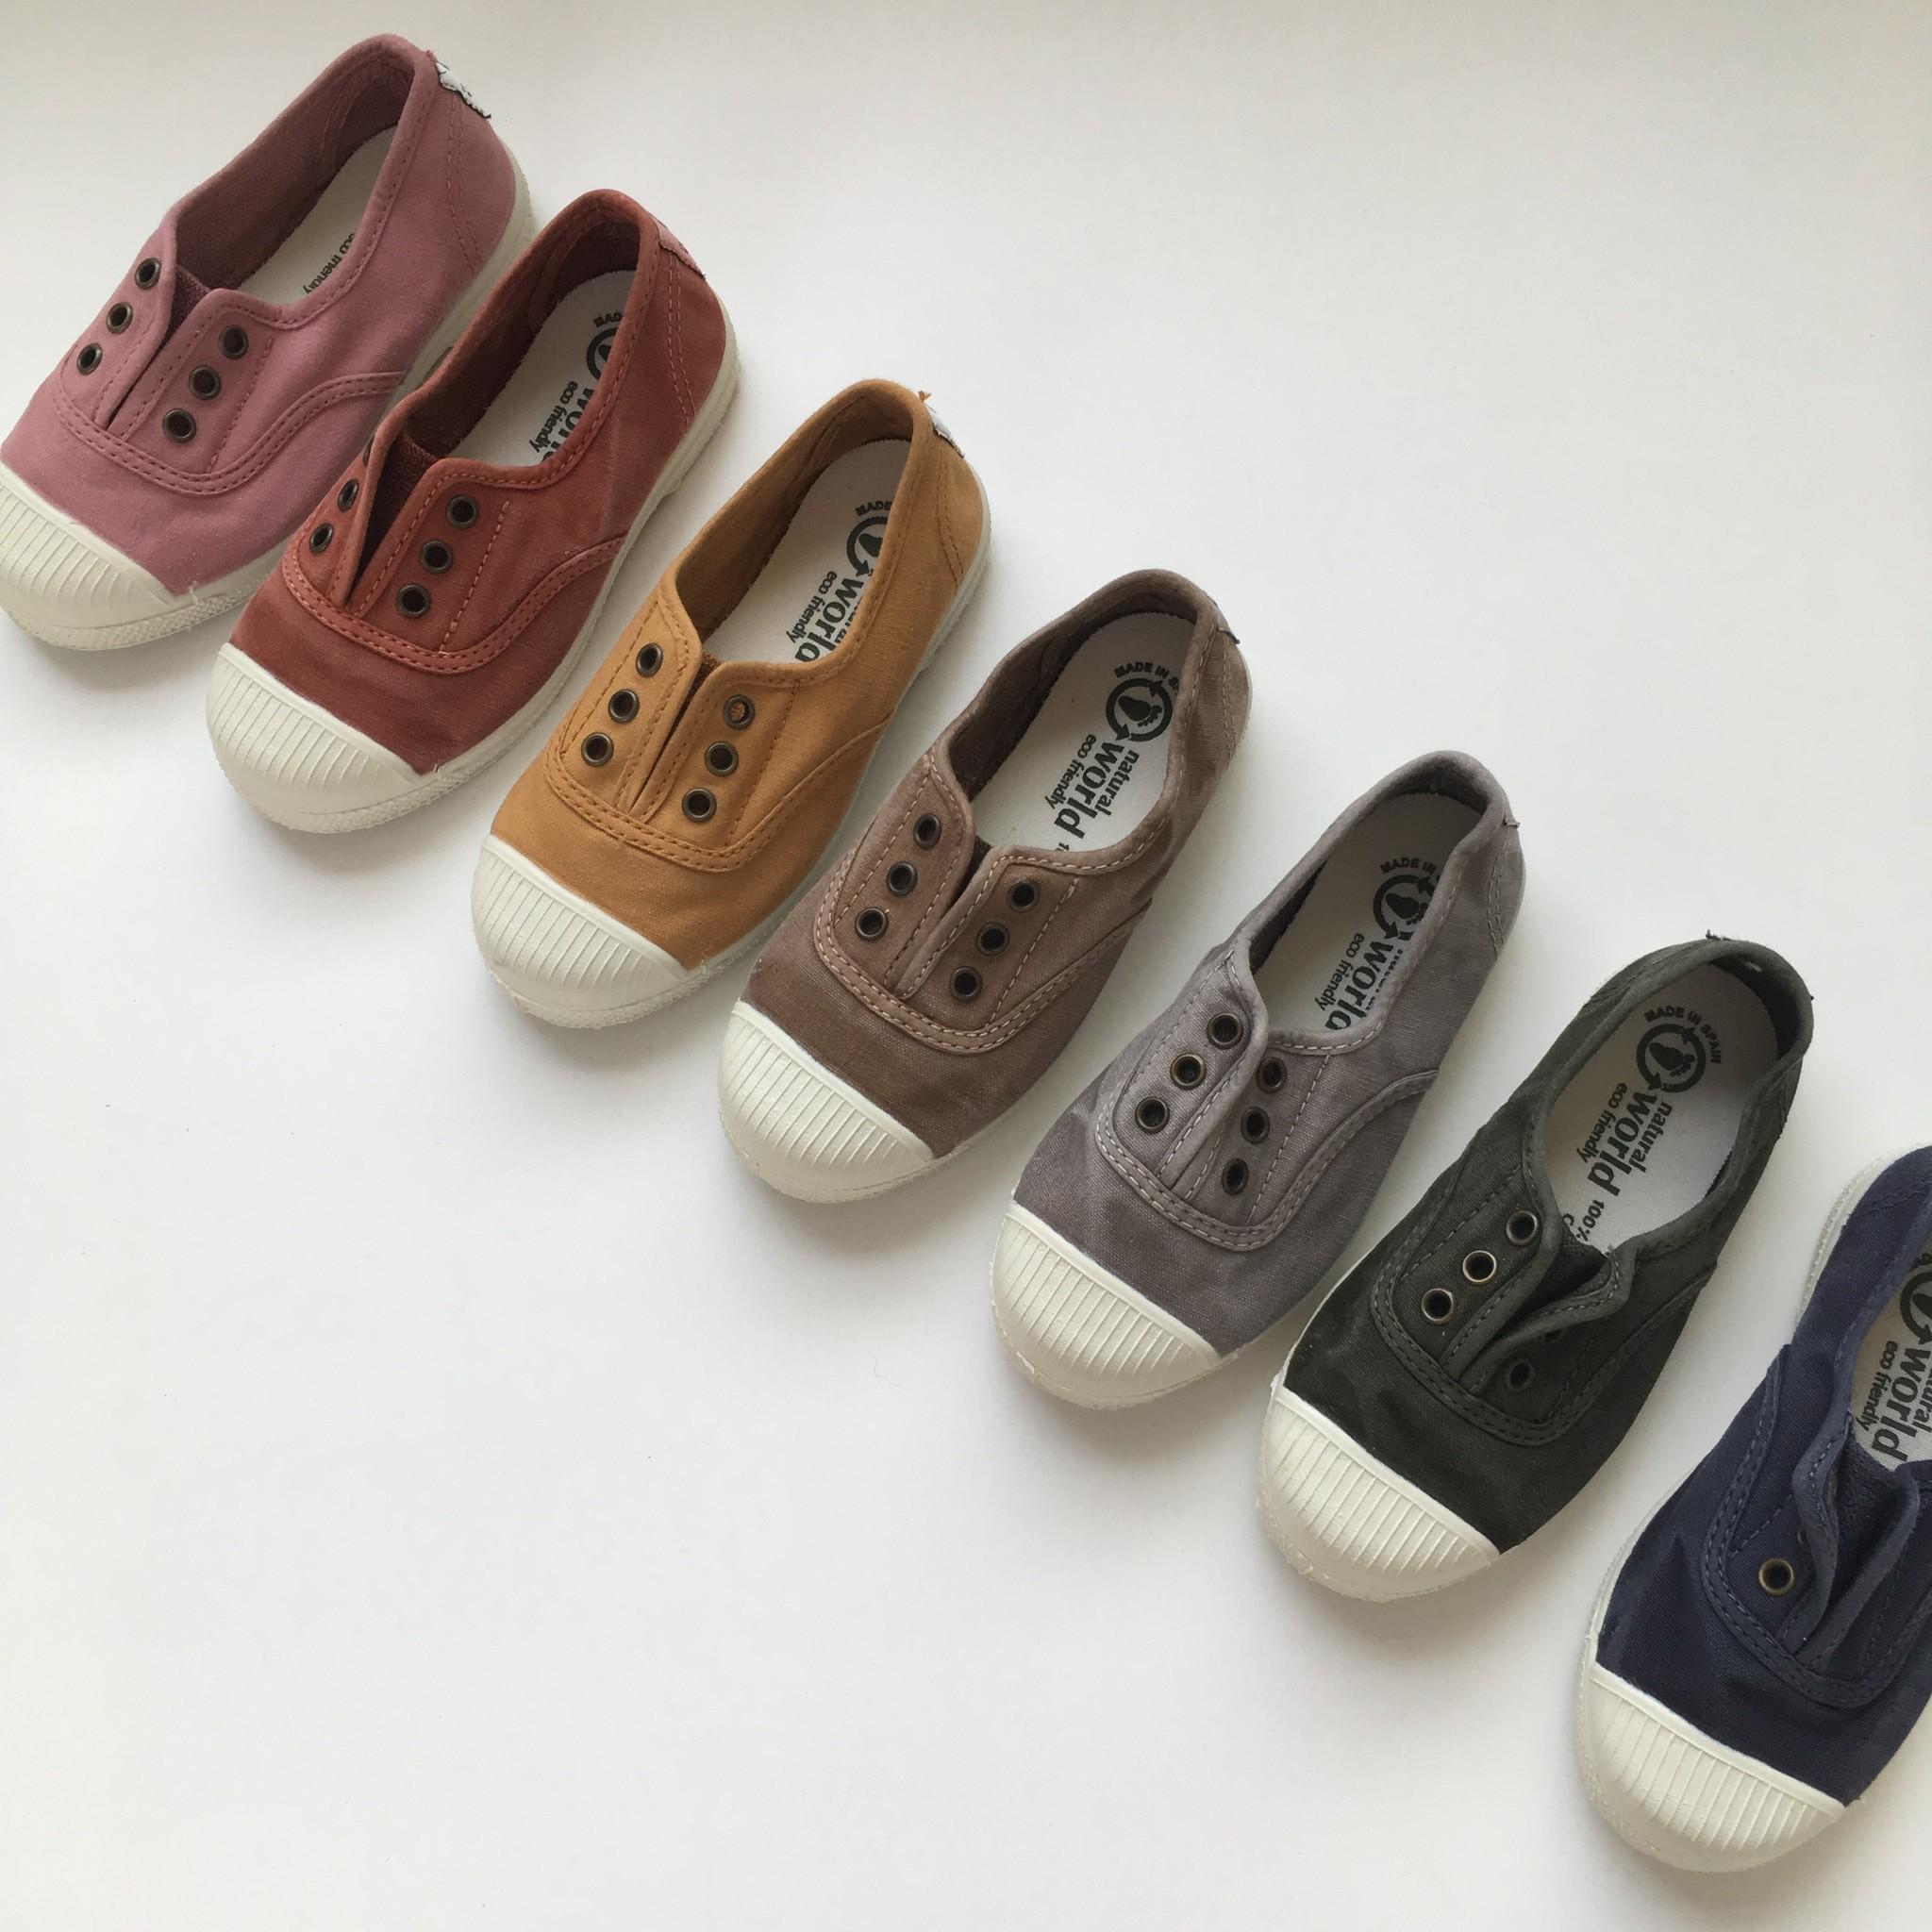 NATURAL WORLD eco kinder sneakers OLD LAVANDA - biologisch katoen - stone washed denim blauw - 21 tm 34